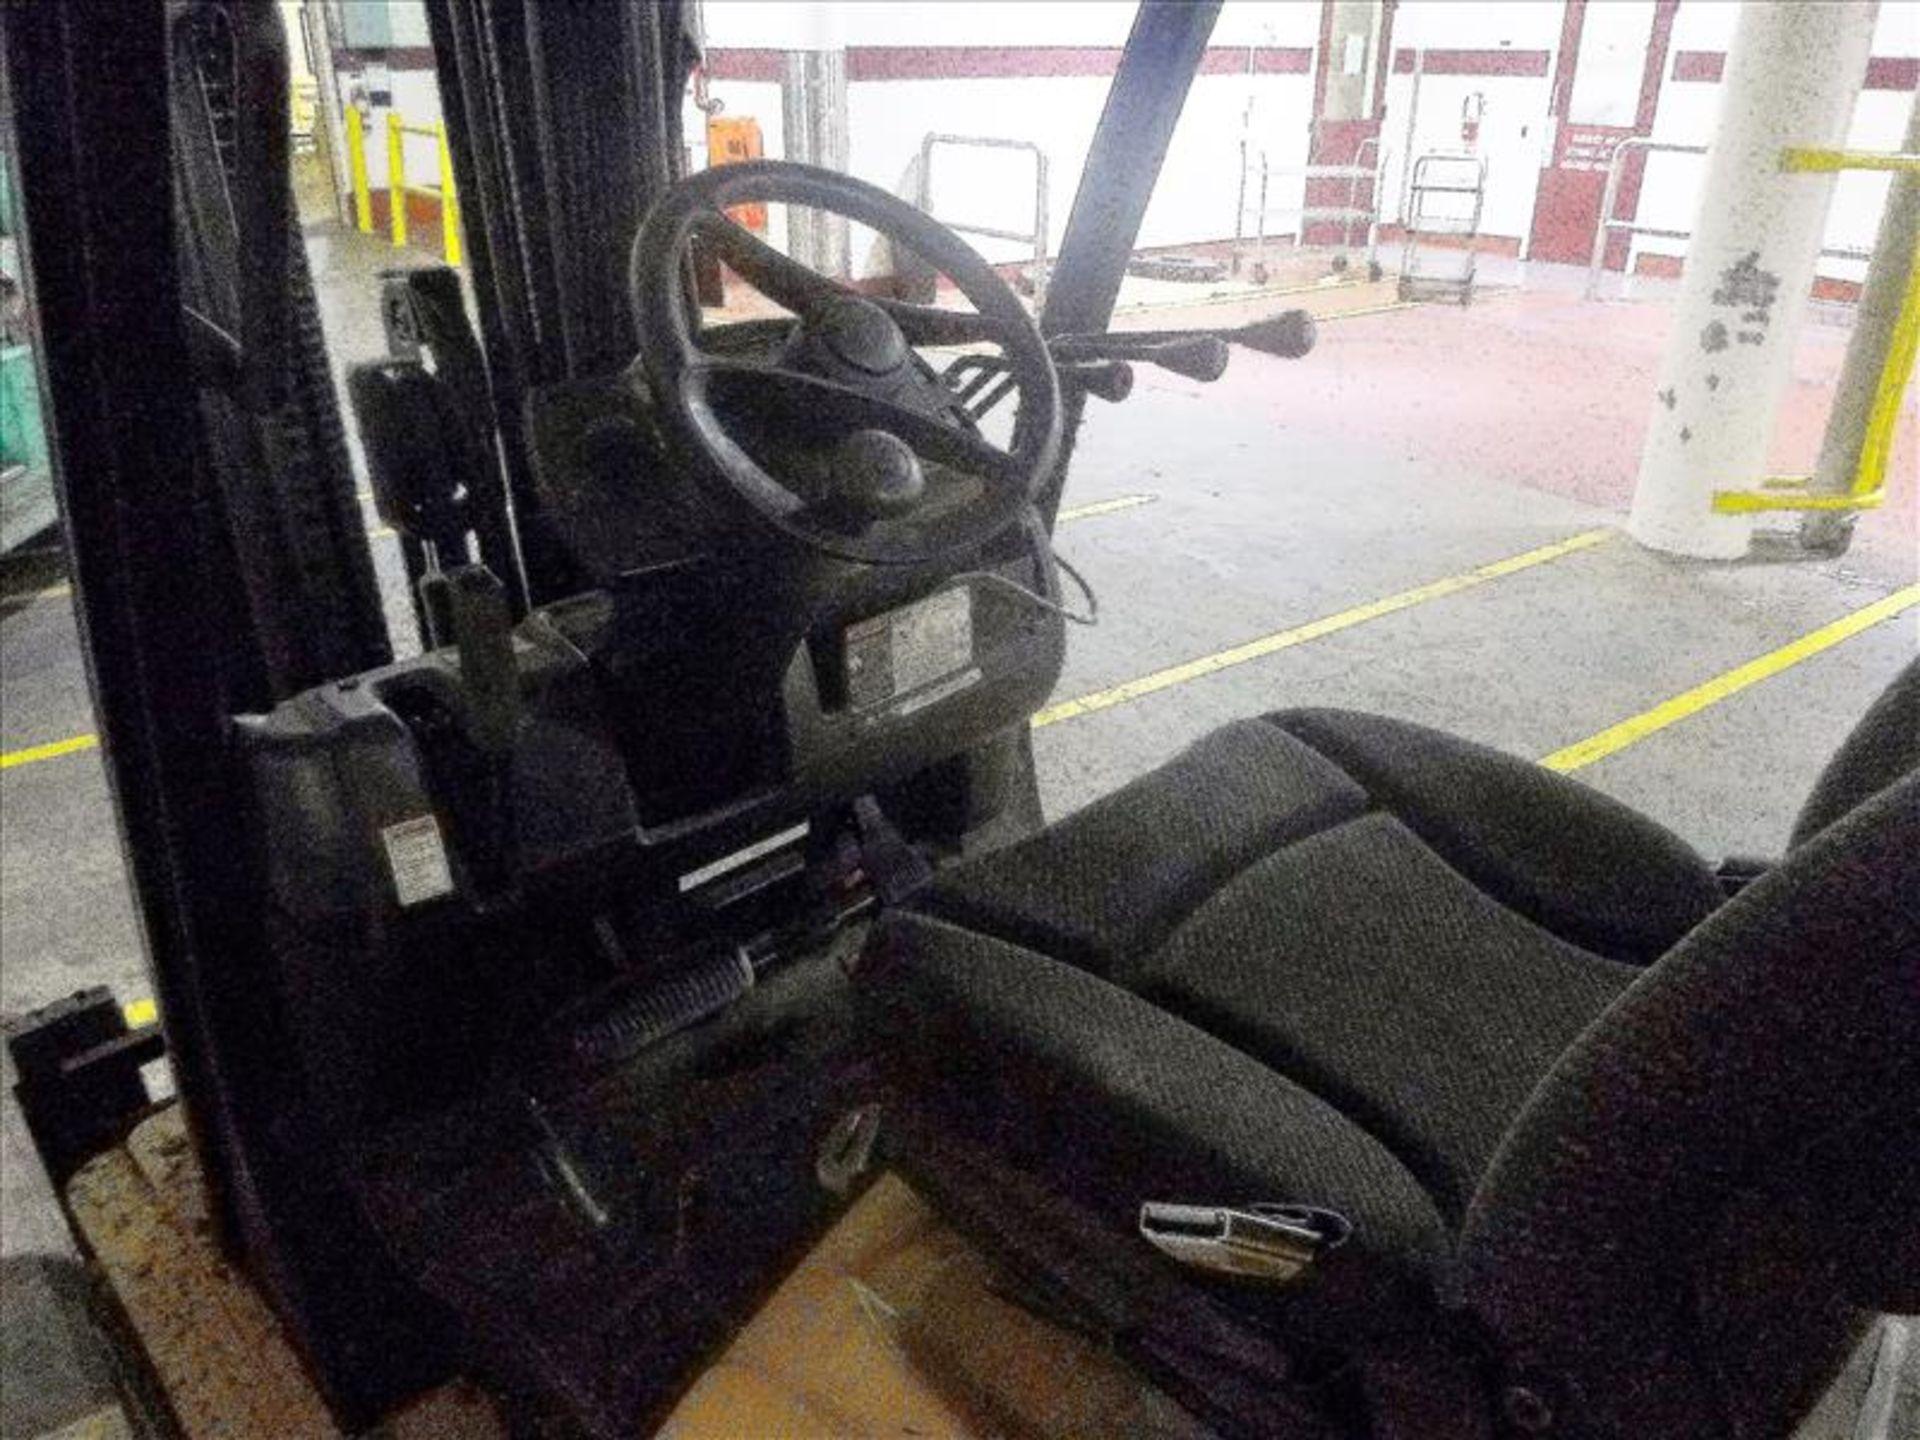 Lot 2003 - Yale fork lift truck, mod. GLC060VXNVSQ084, ser. no. A910V21260K, LPG, 4000 lbs cap., 240 in. lift